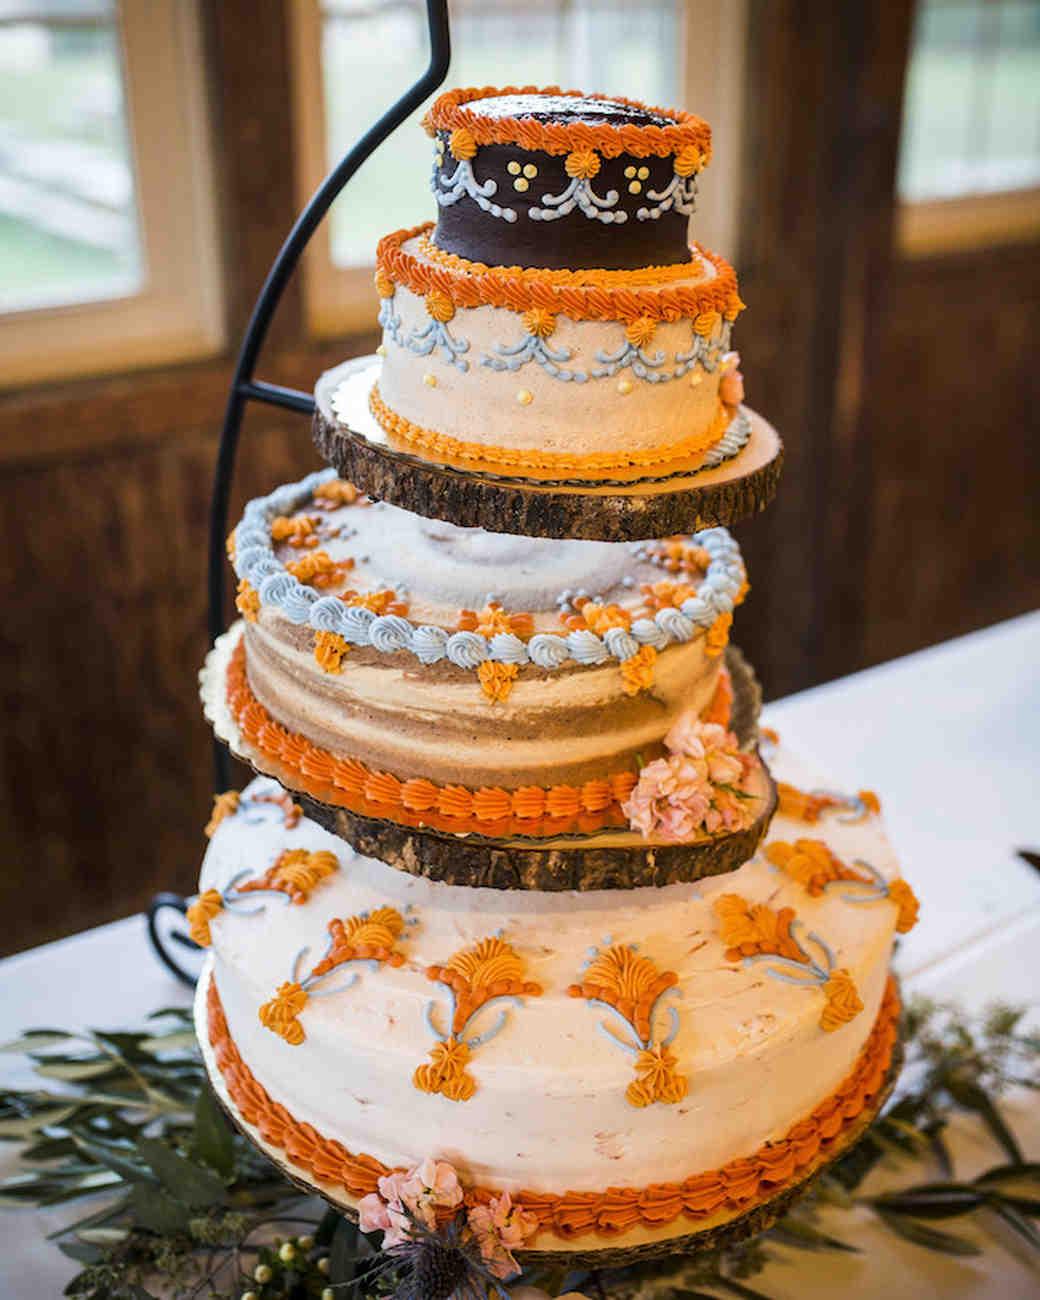 Exciting Vegan Wedding Cakes Images Design Ideas   Dievoon